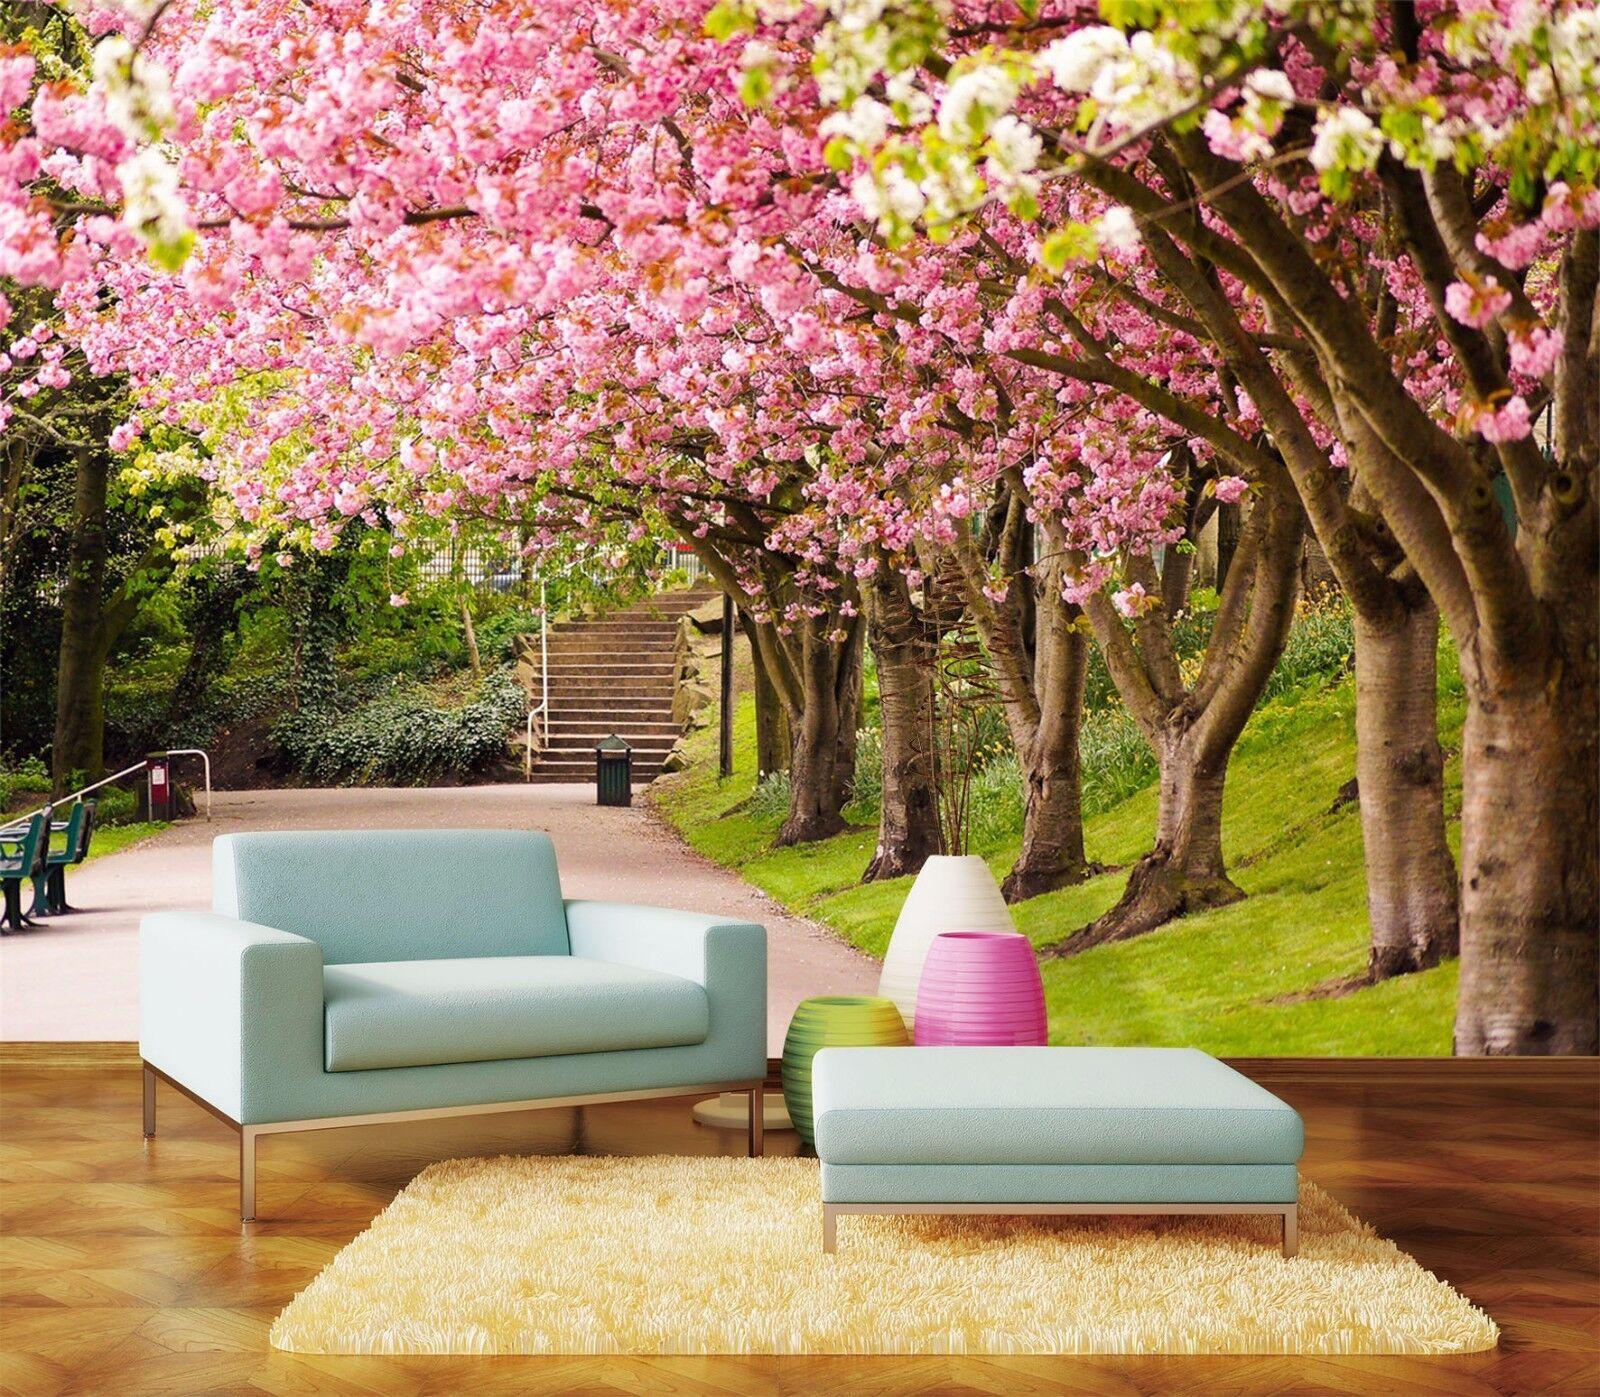 3D Trees rose Flowers 1859 Wallpaper Decal Dercor Home Kids Nursery Mural Home